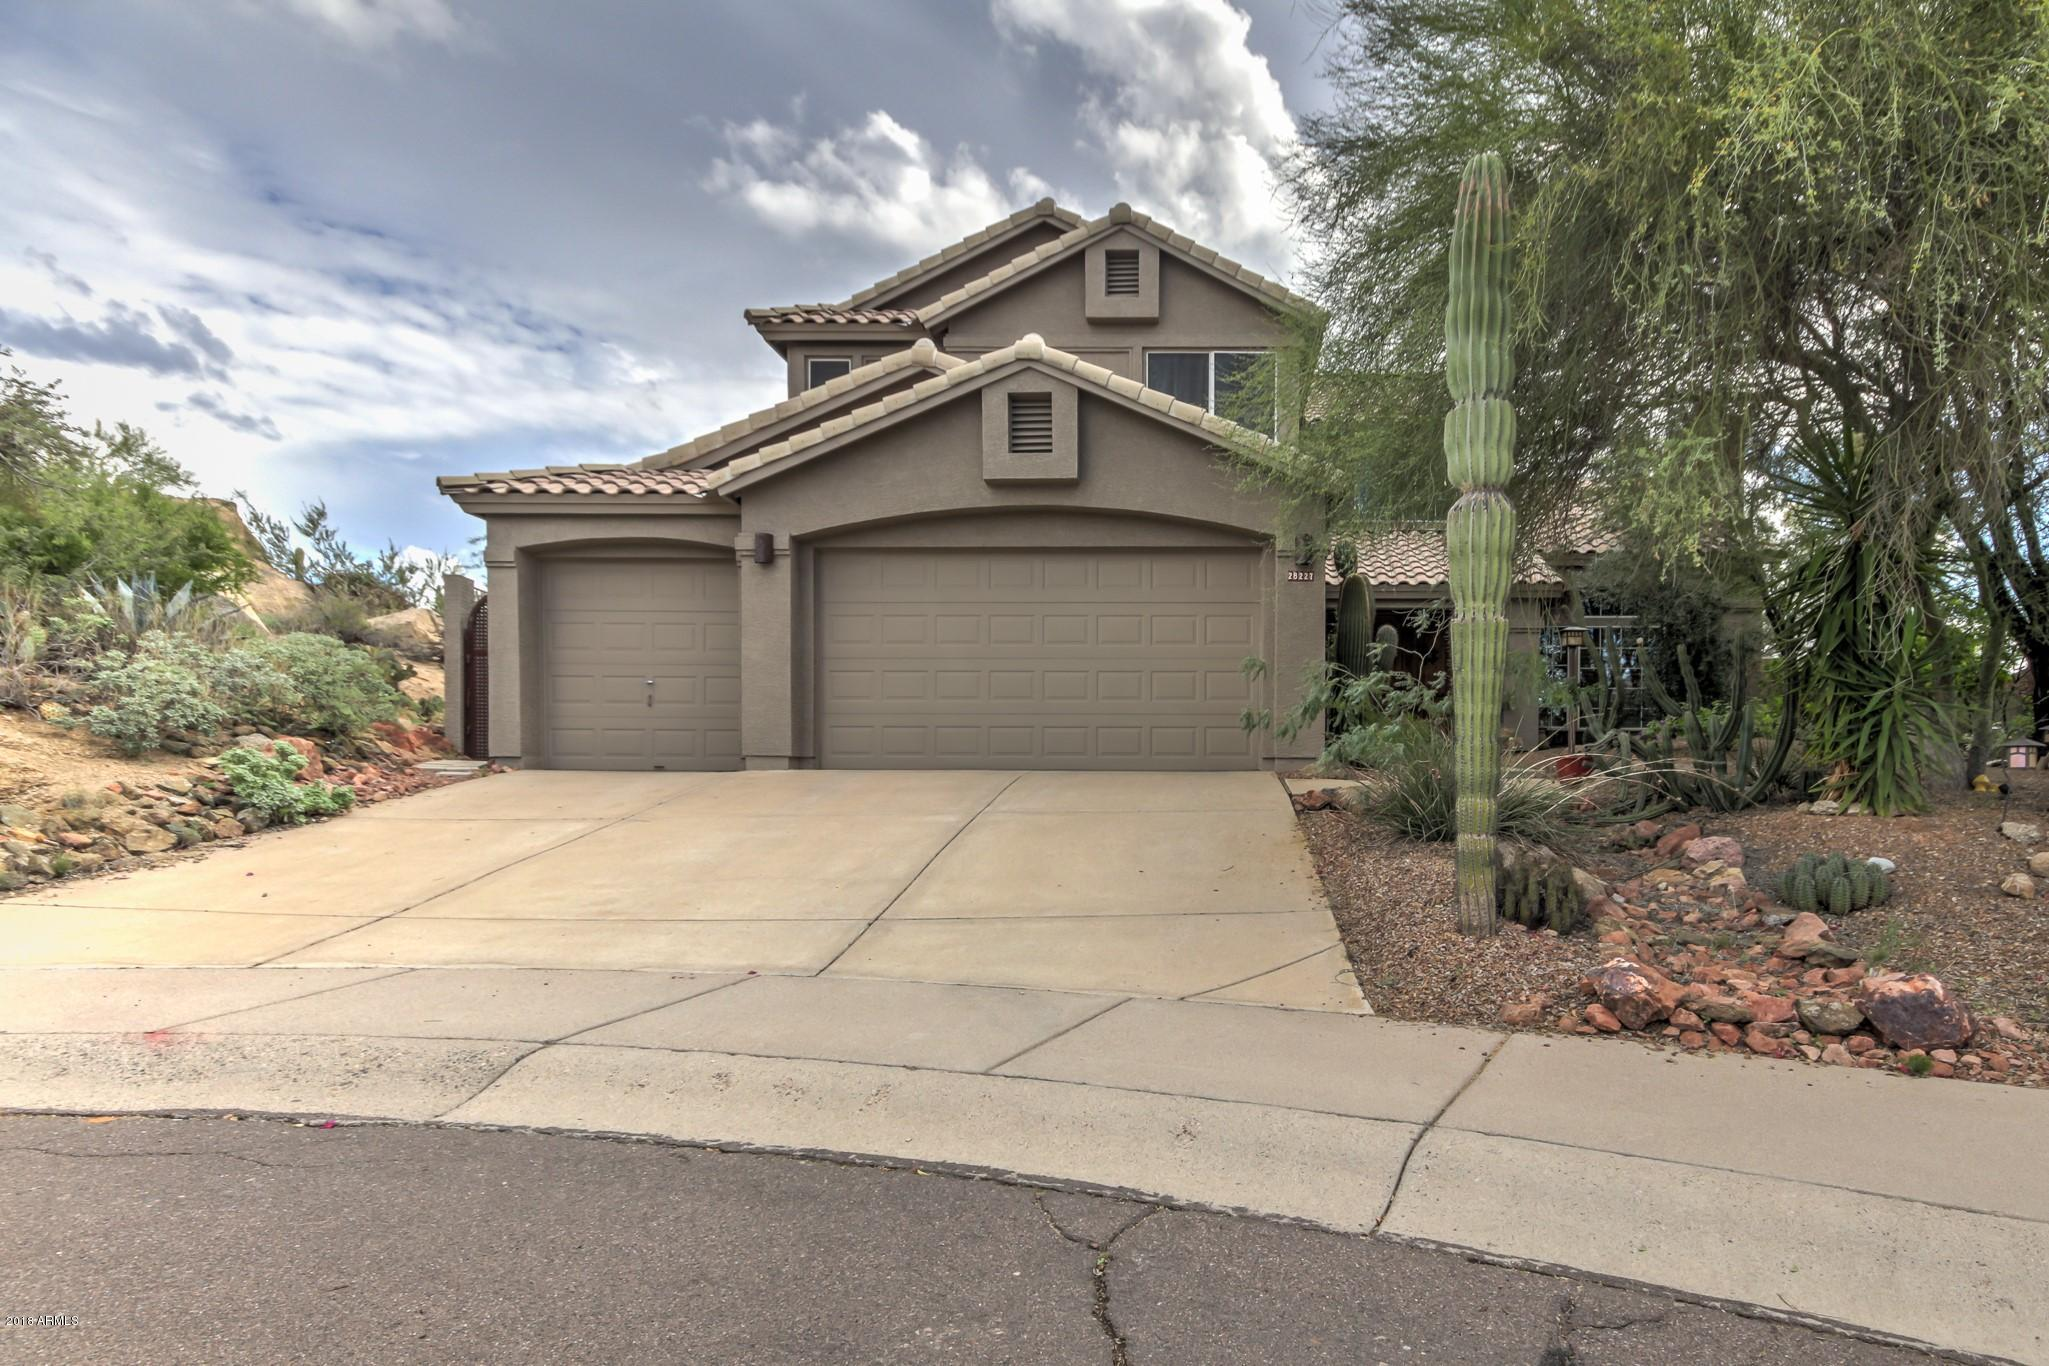 Photo of 28227 N 111TH Way, Scottsdale, AZ 85262